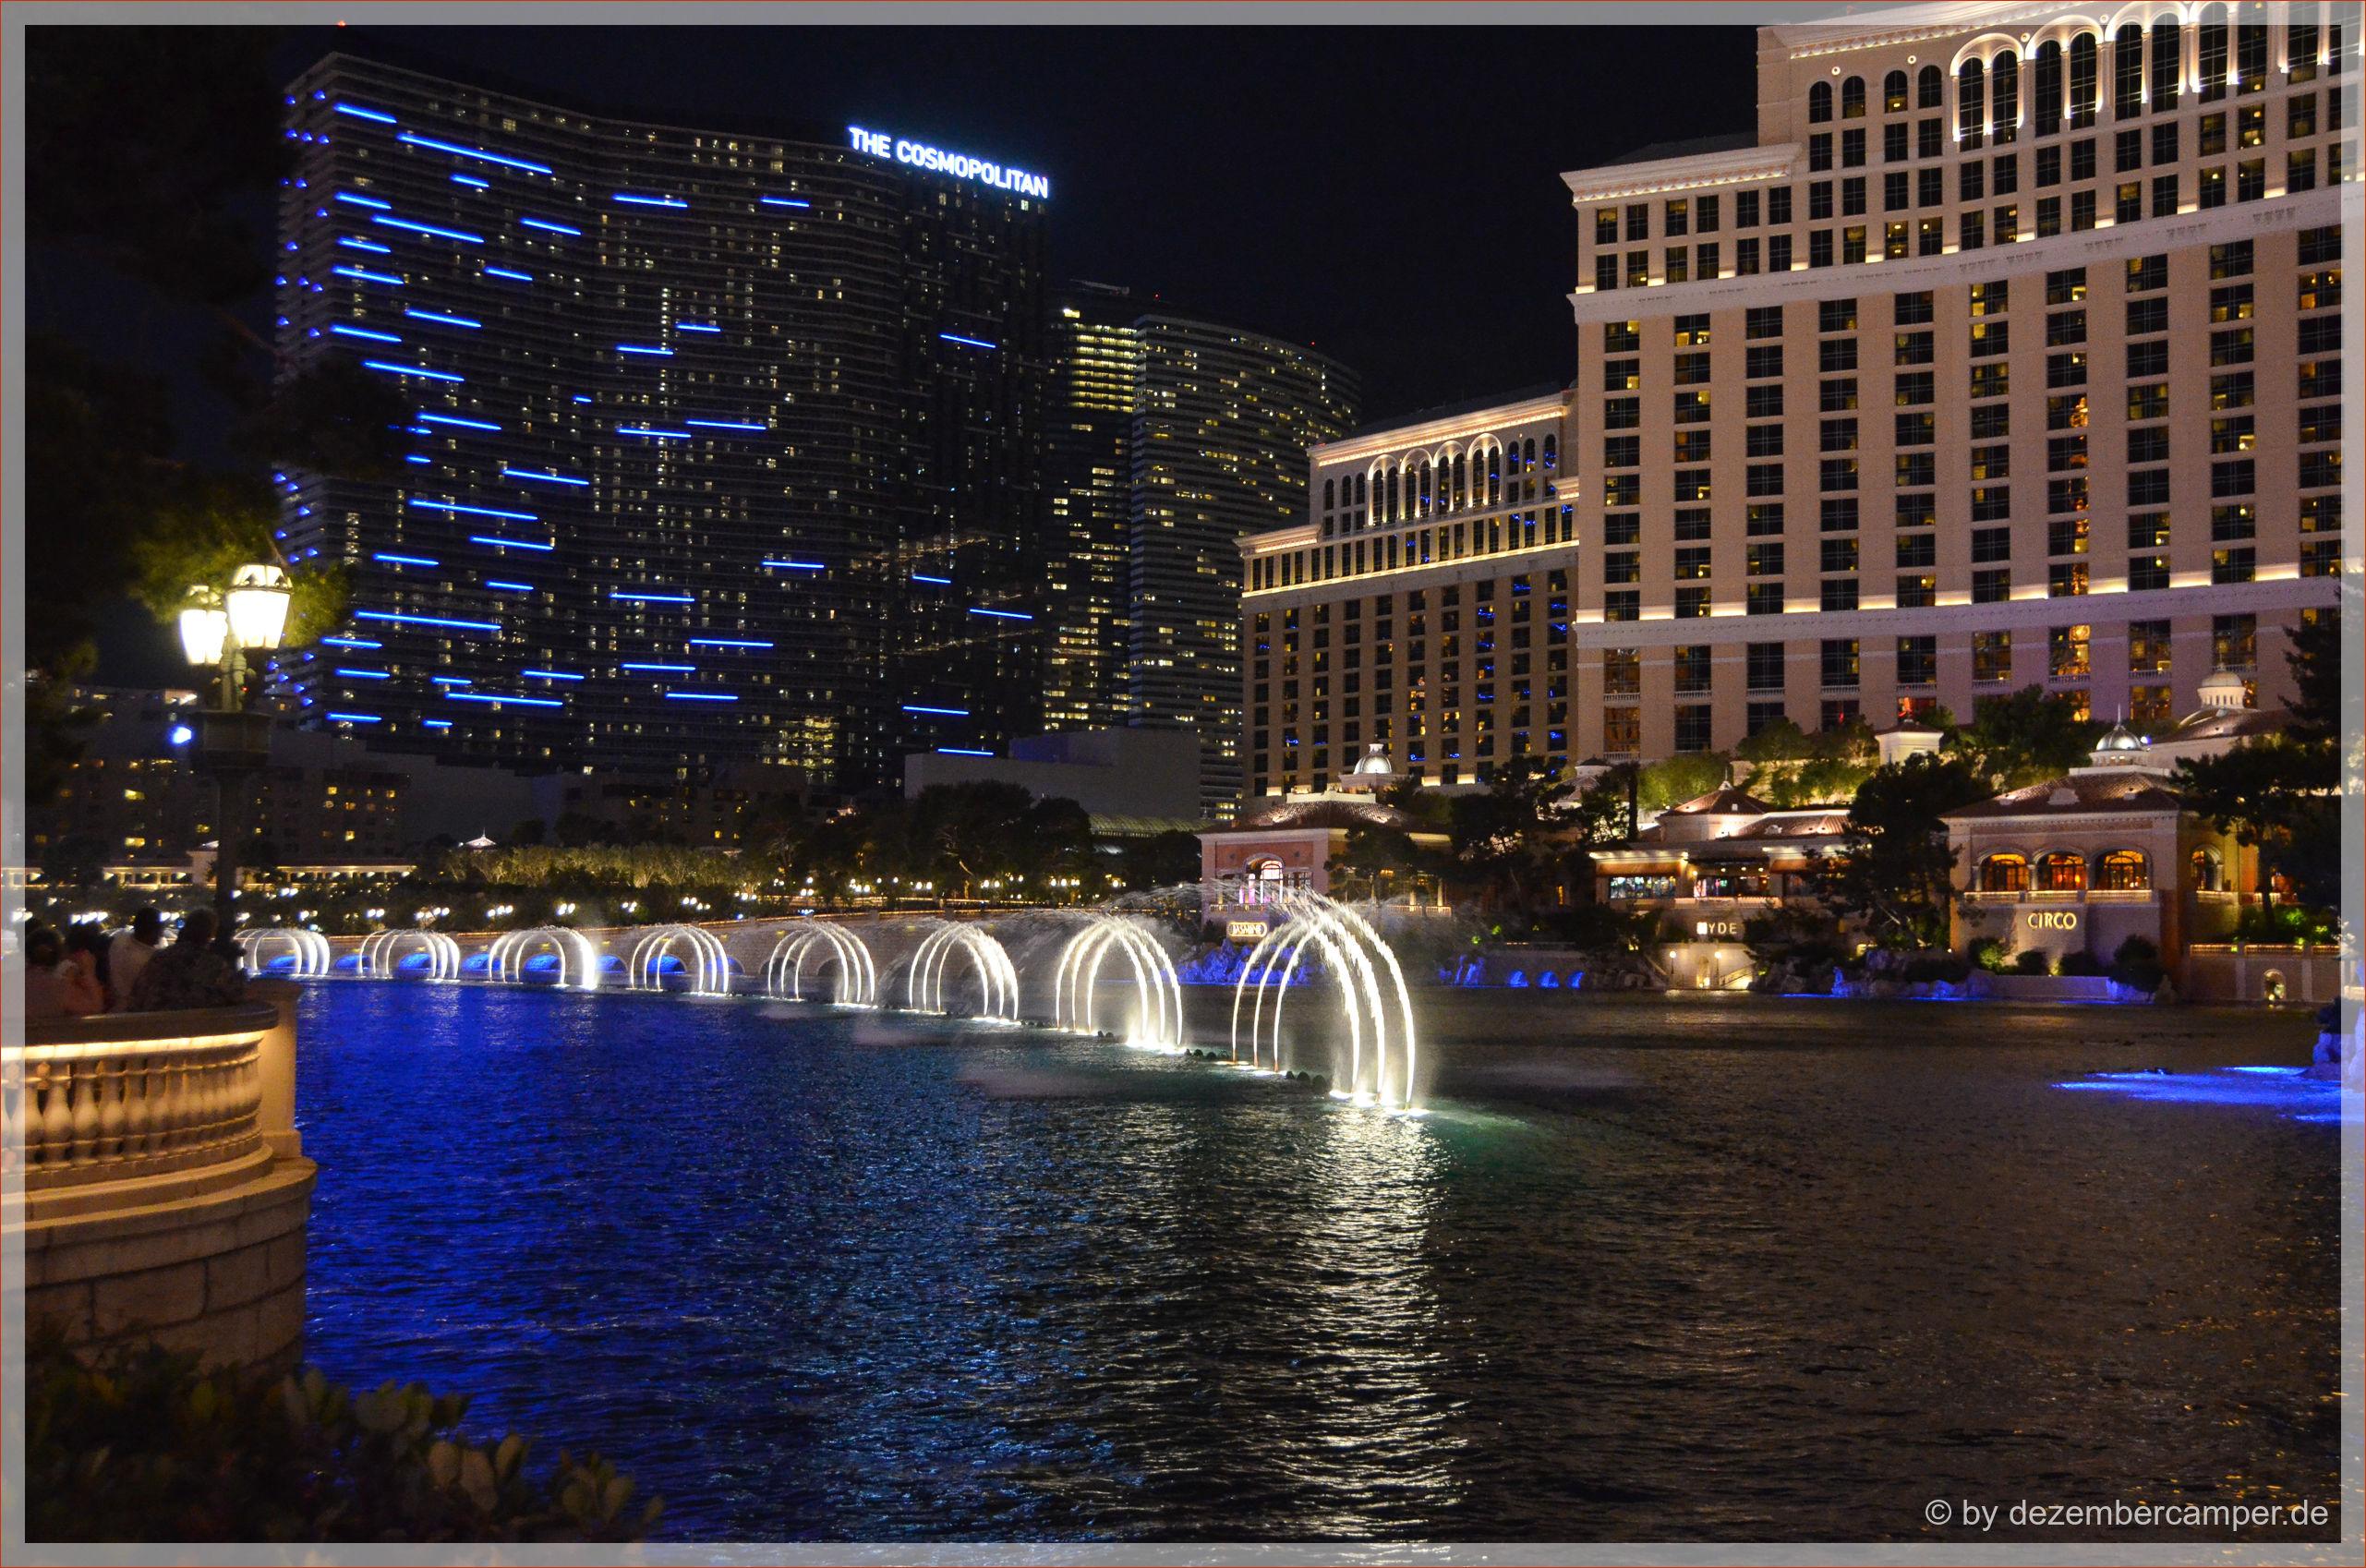 Las Vegas - Bellagio